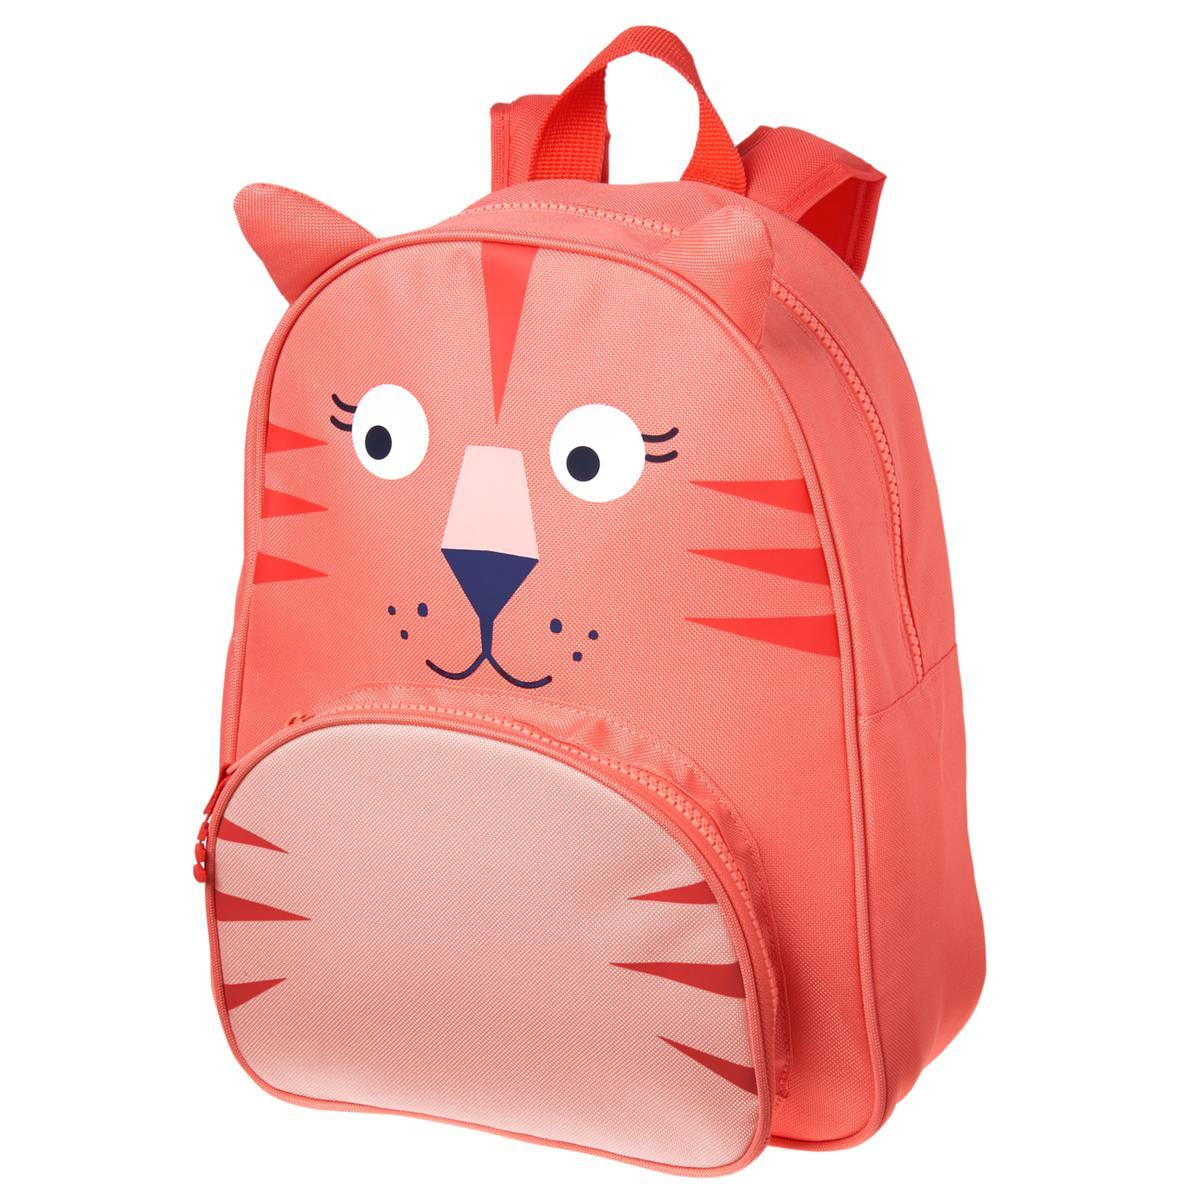 Детский рюкзак ранец Gymboree рюкзаки для мальчика девочки Джимбори США